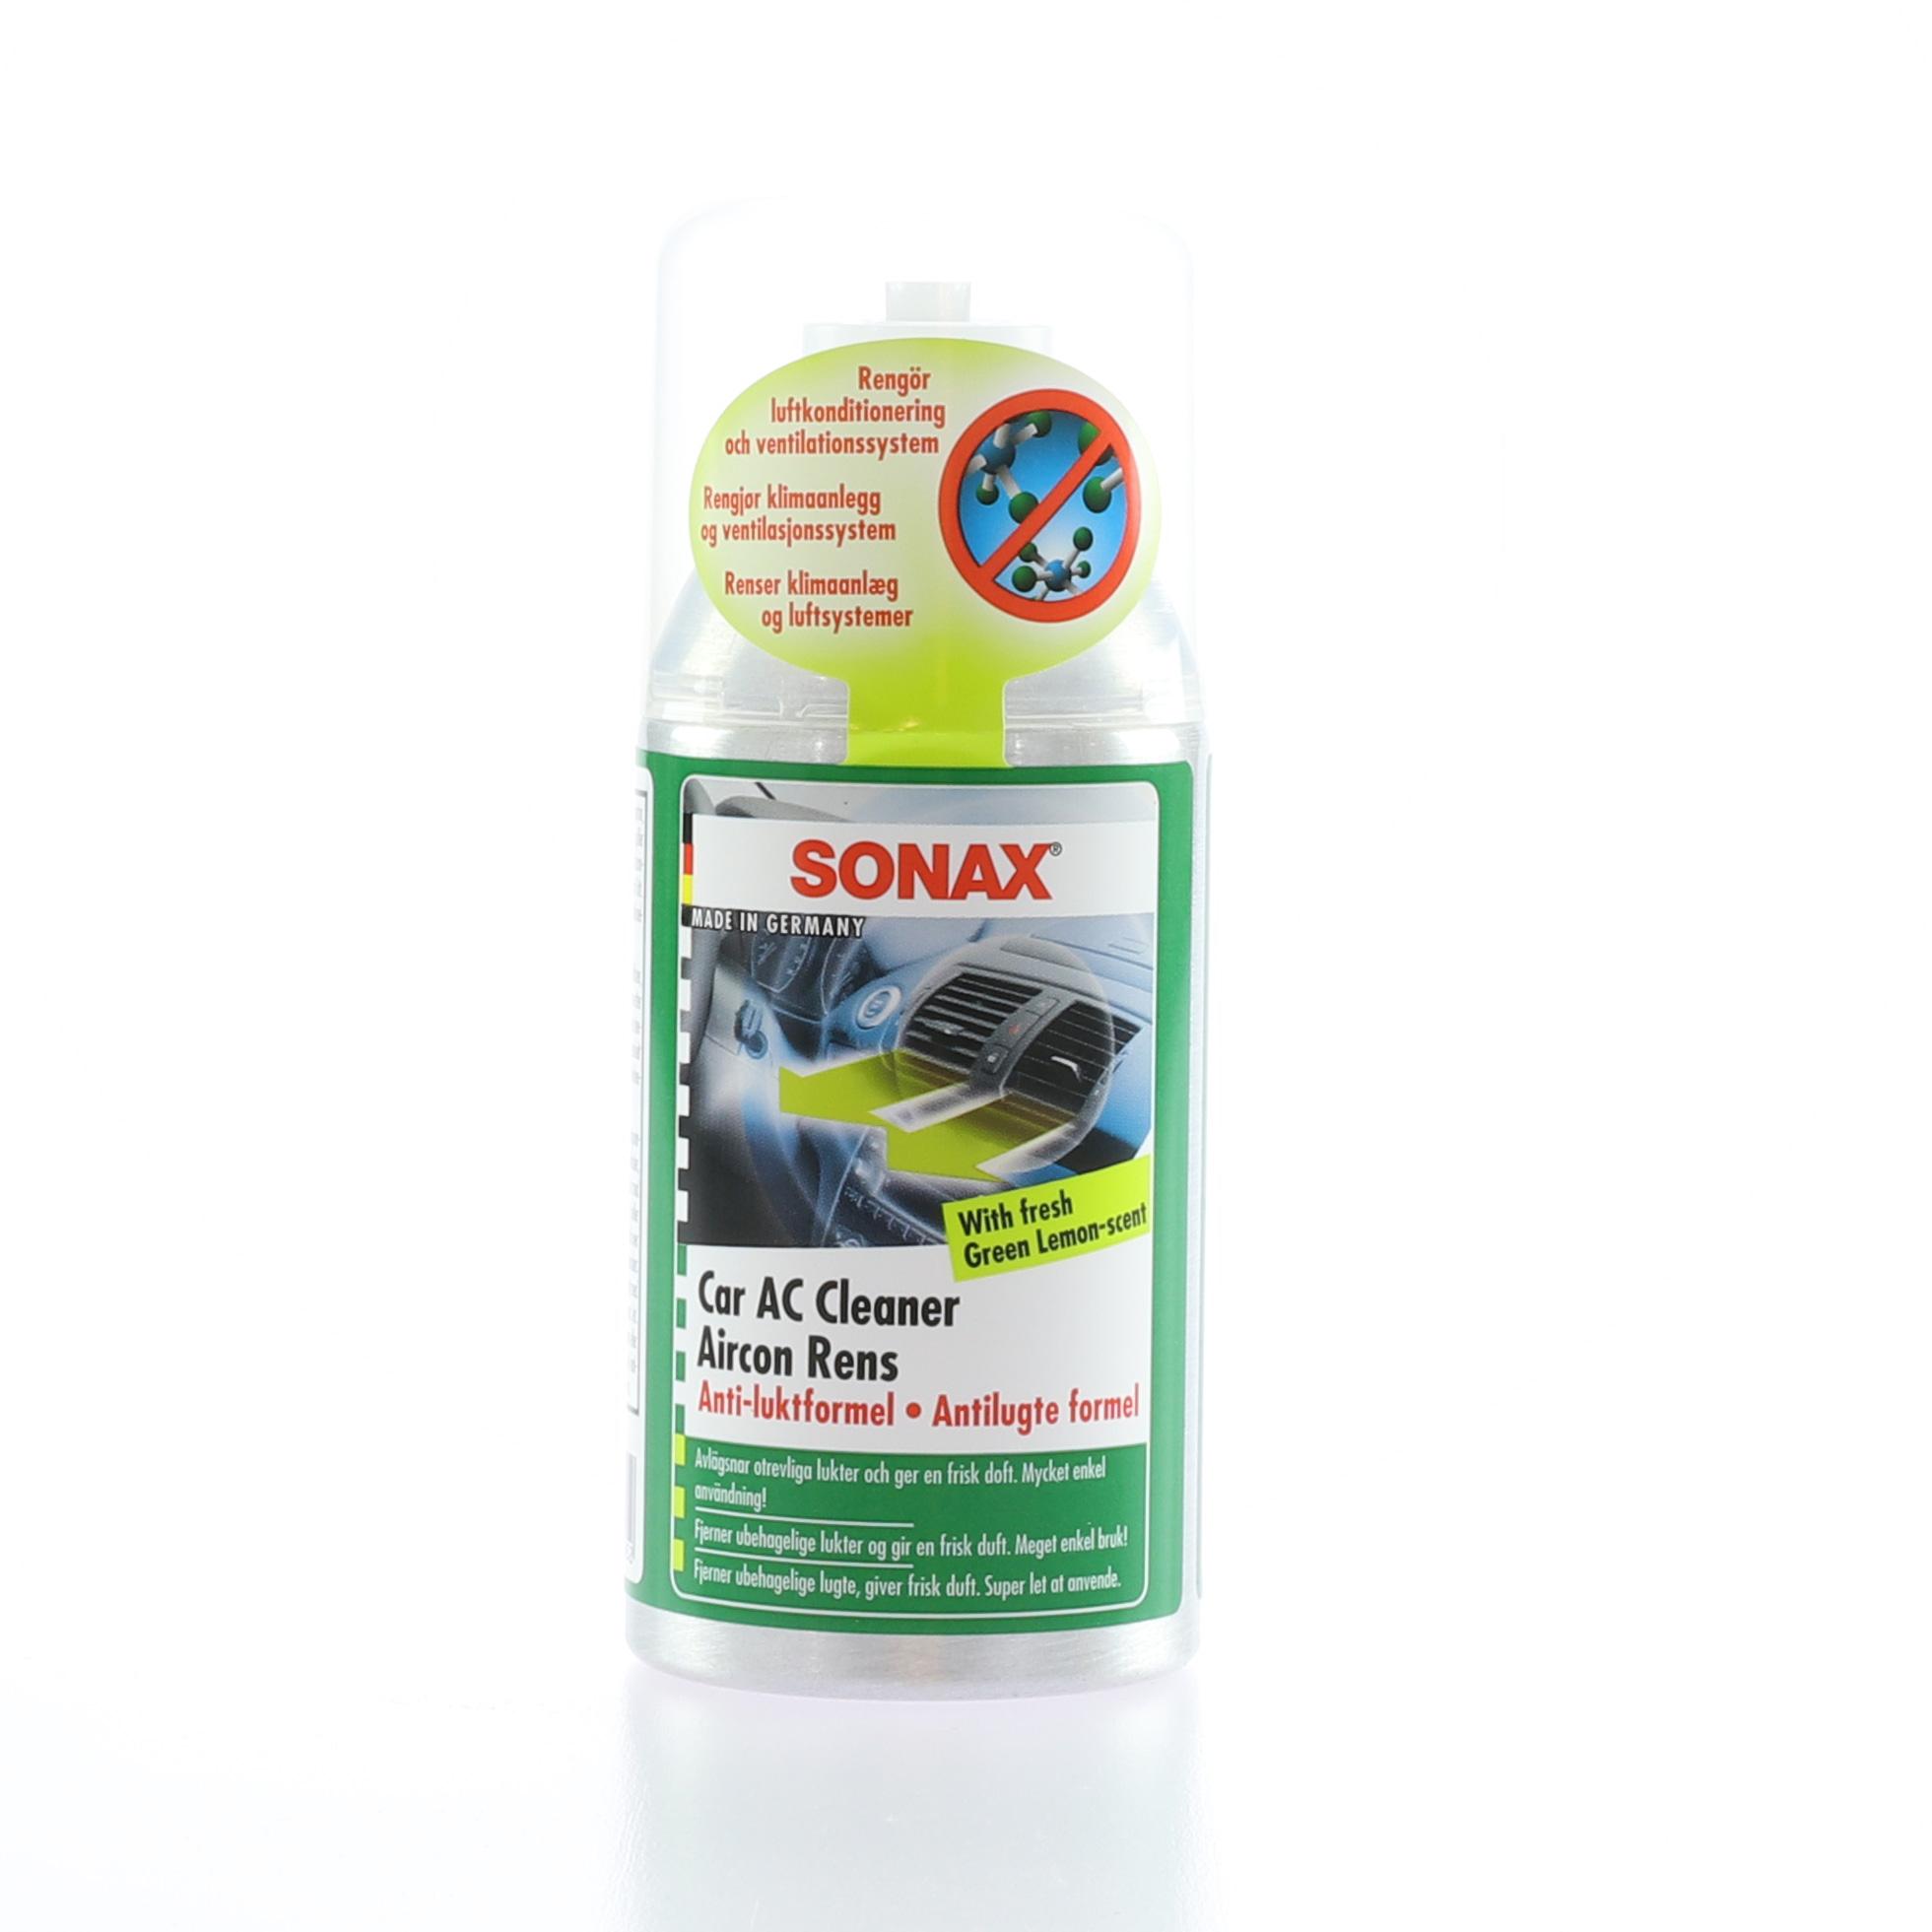 Luktborttagare Sonax Car AC Cleaner, 100 ml